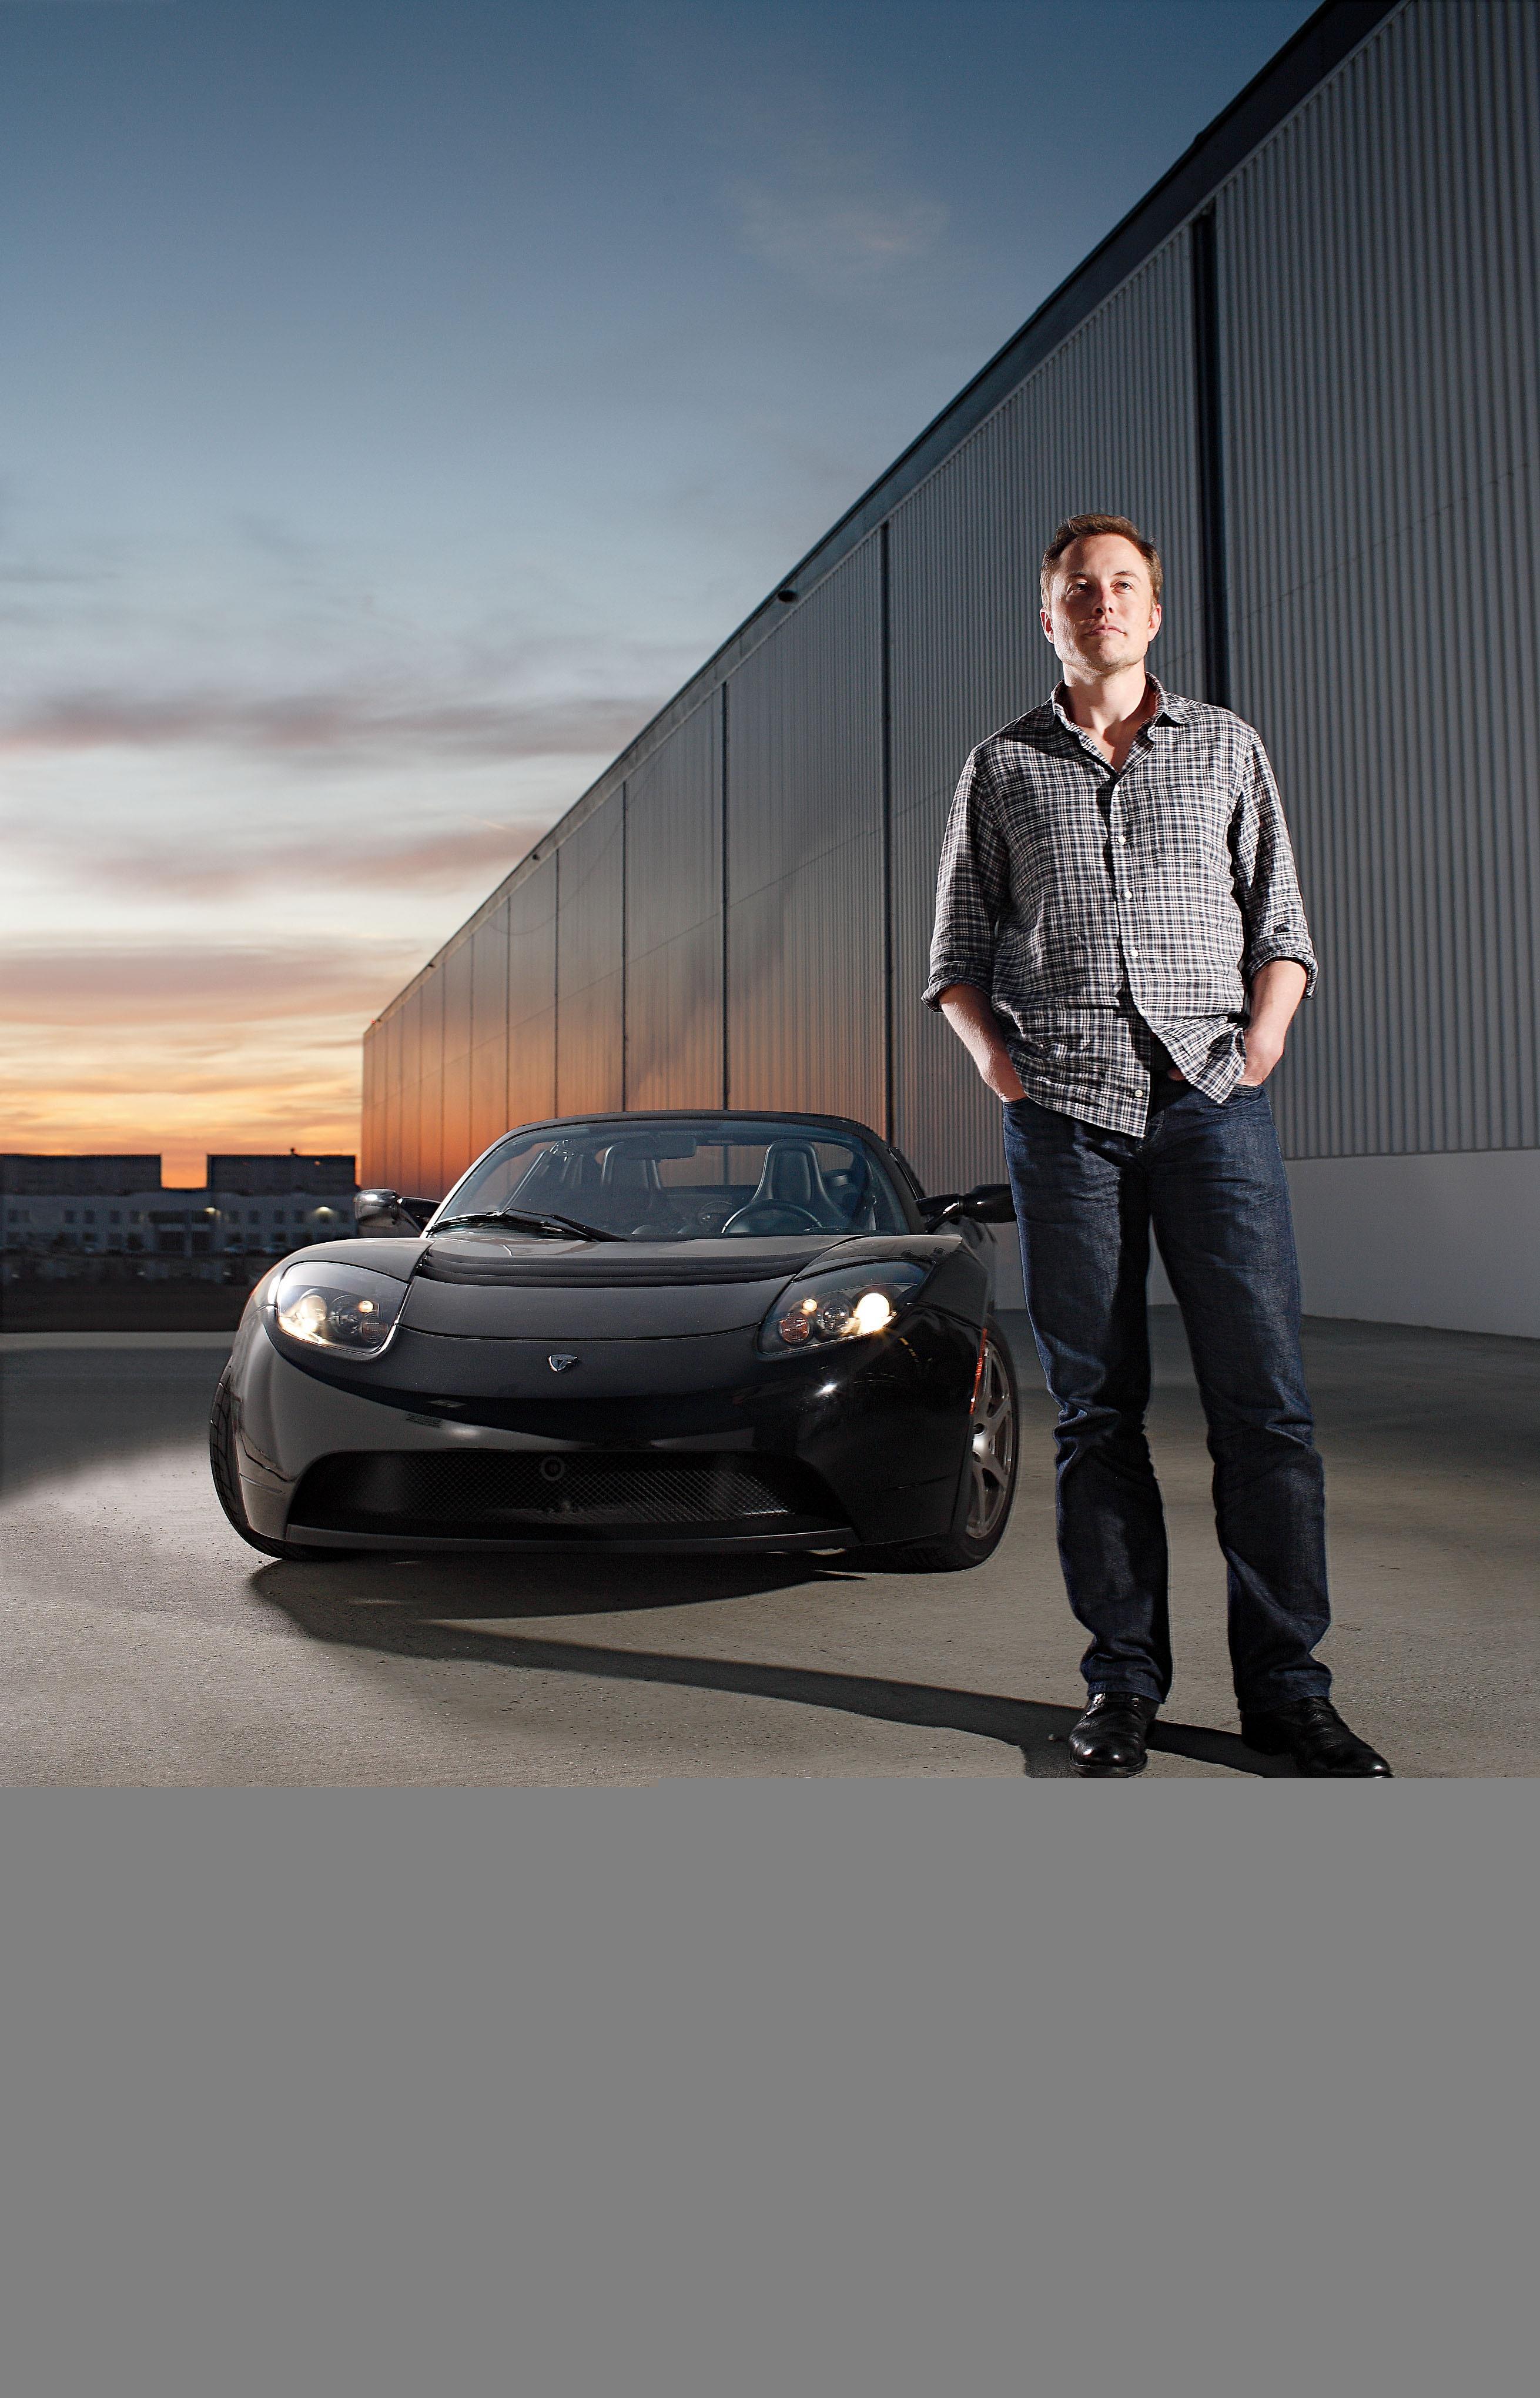 Elon Musk is the CEO of U.K. based electric car company Tesla Motors